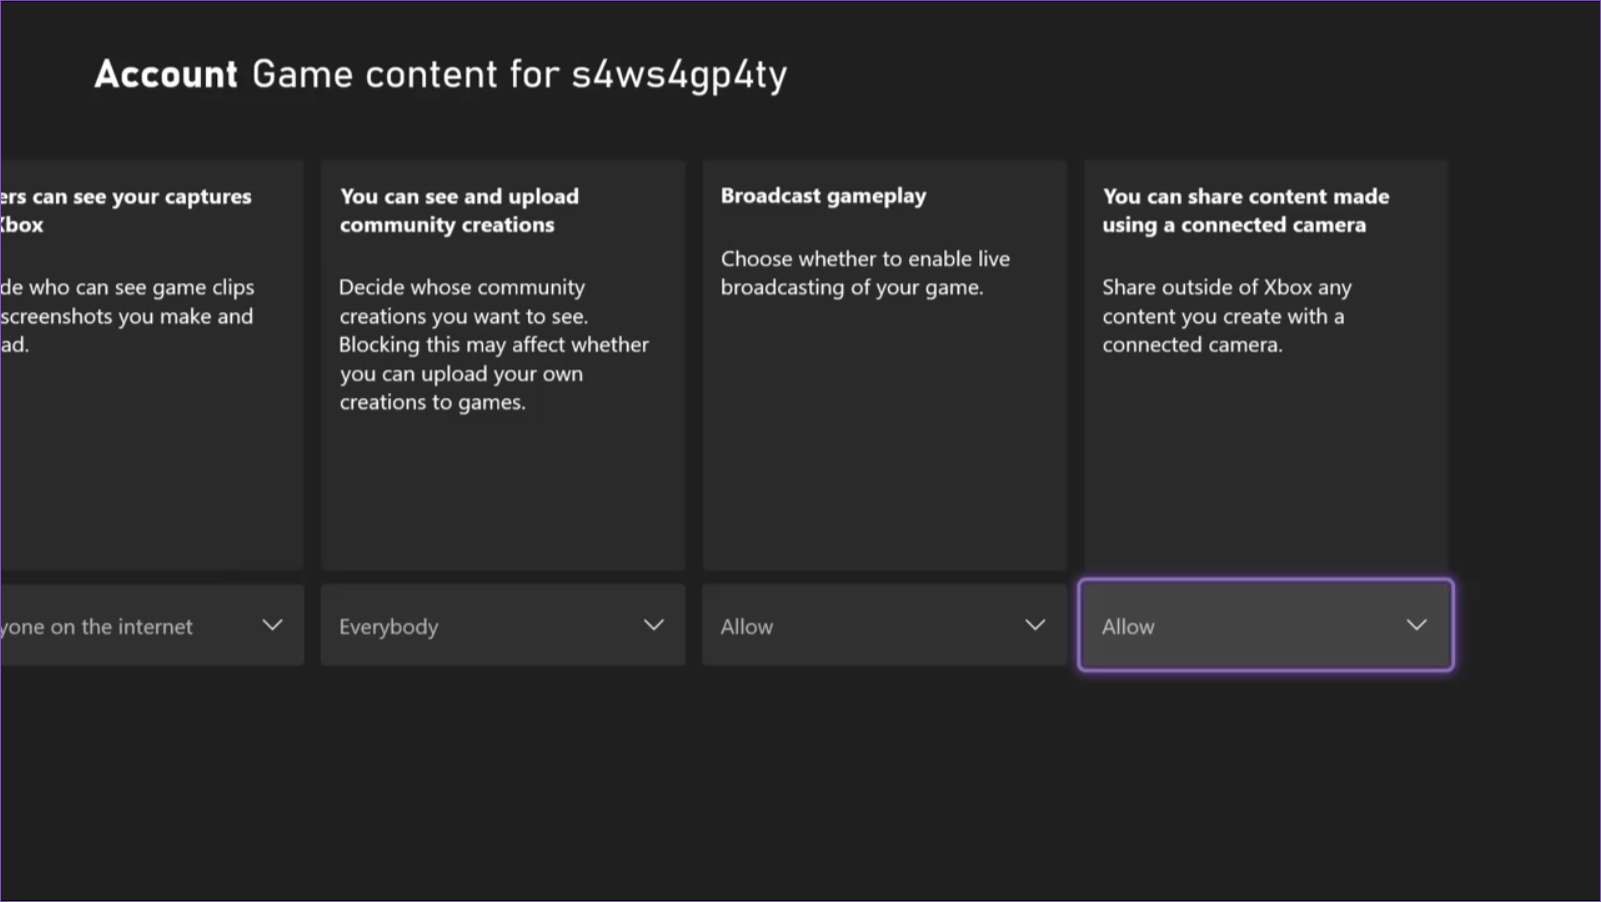 Xbox allow broadcast gameplay